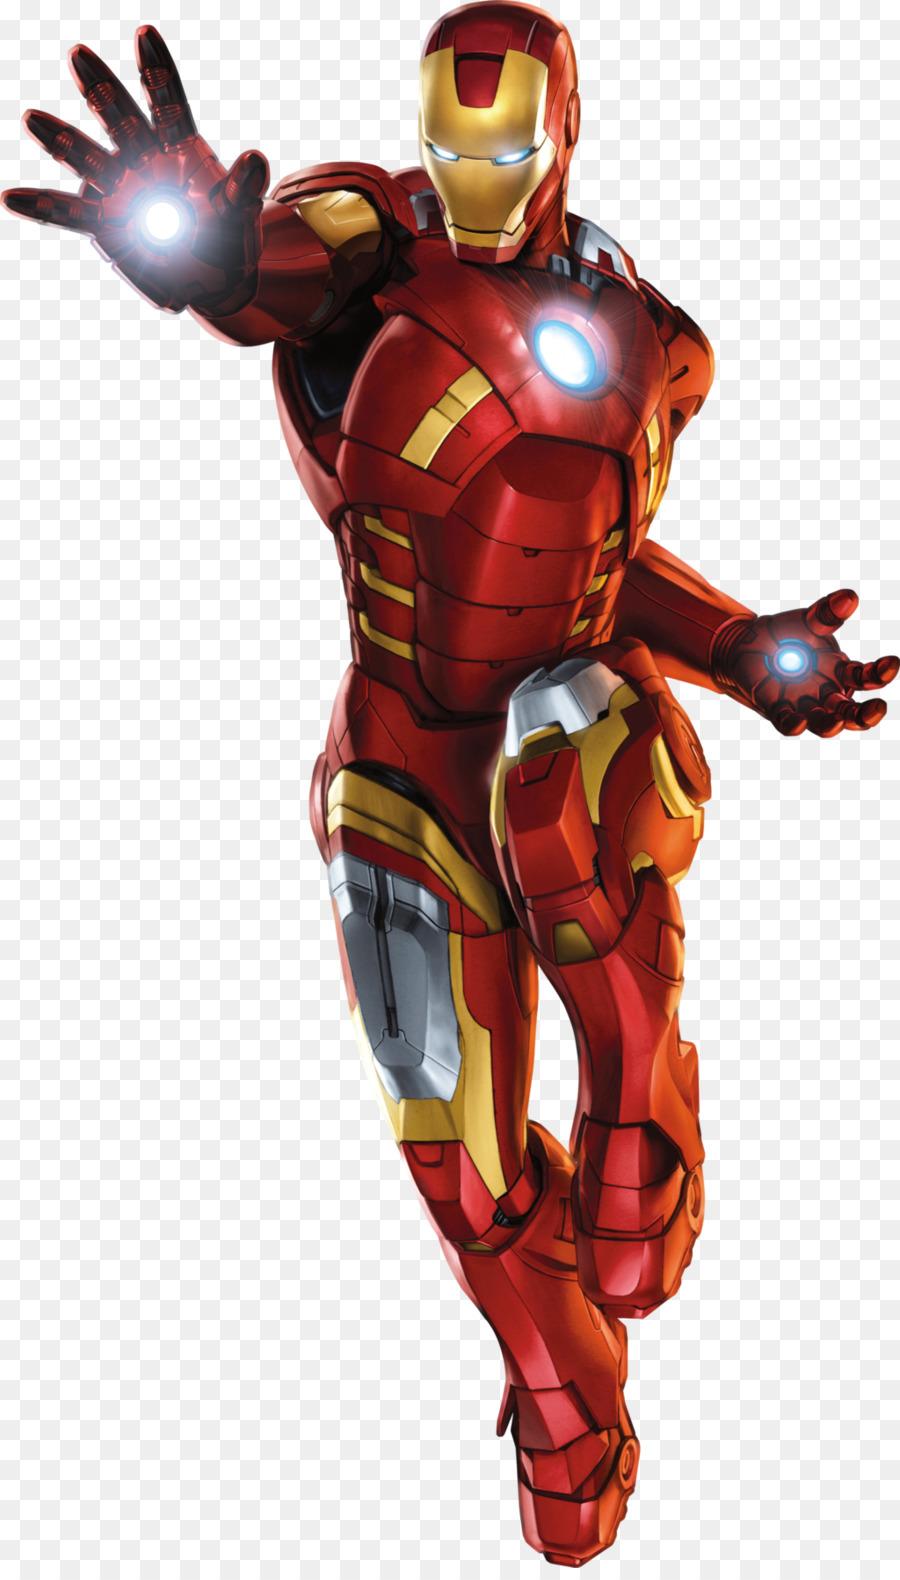 Homem de ferro clipart image library library Iron Man Cartoon png download - 1024*1784 - Free Transparent Iron ... image library library